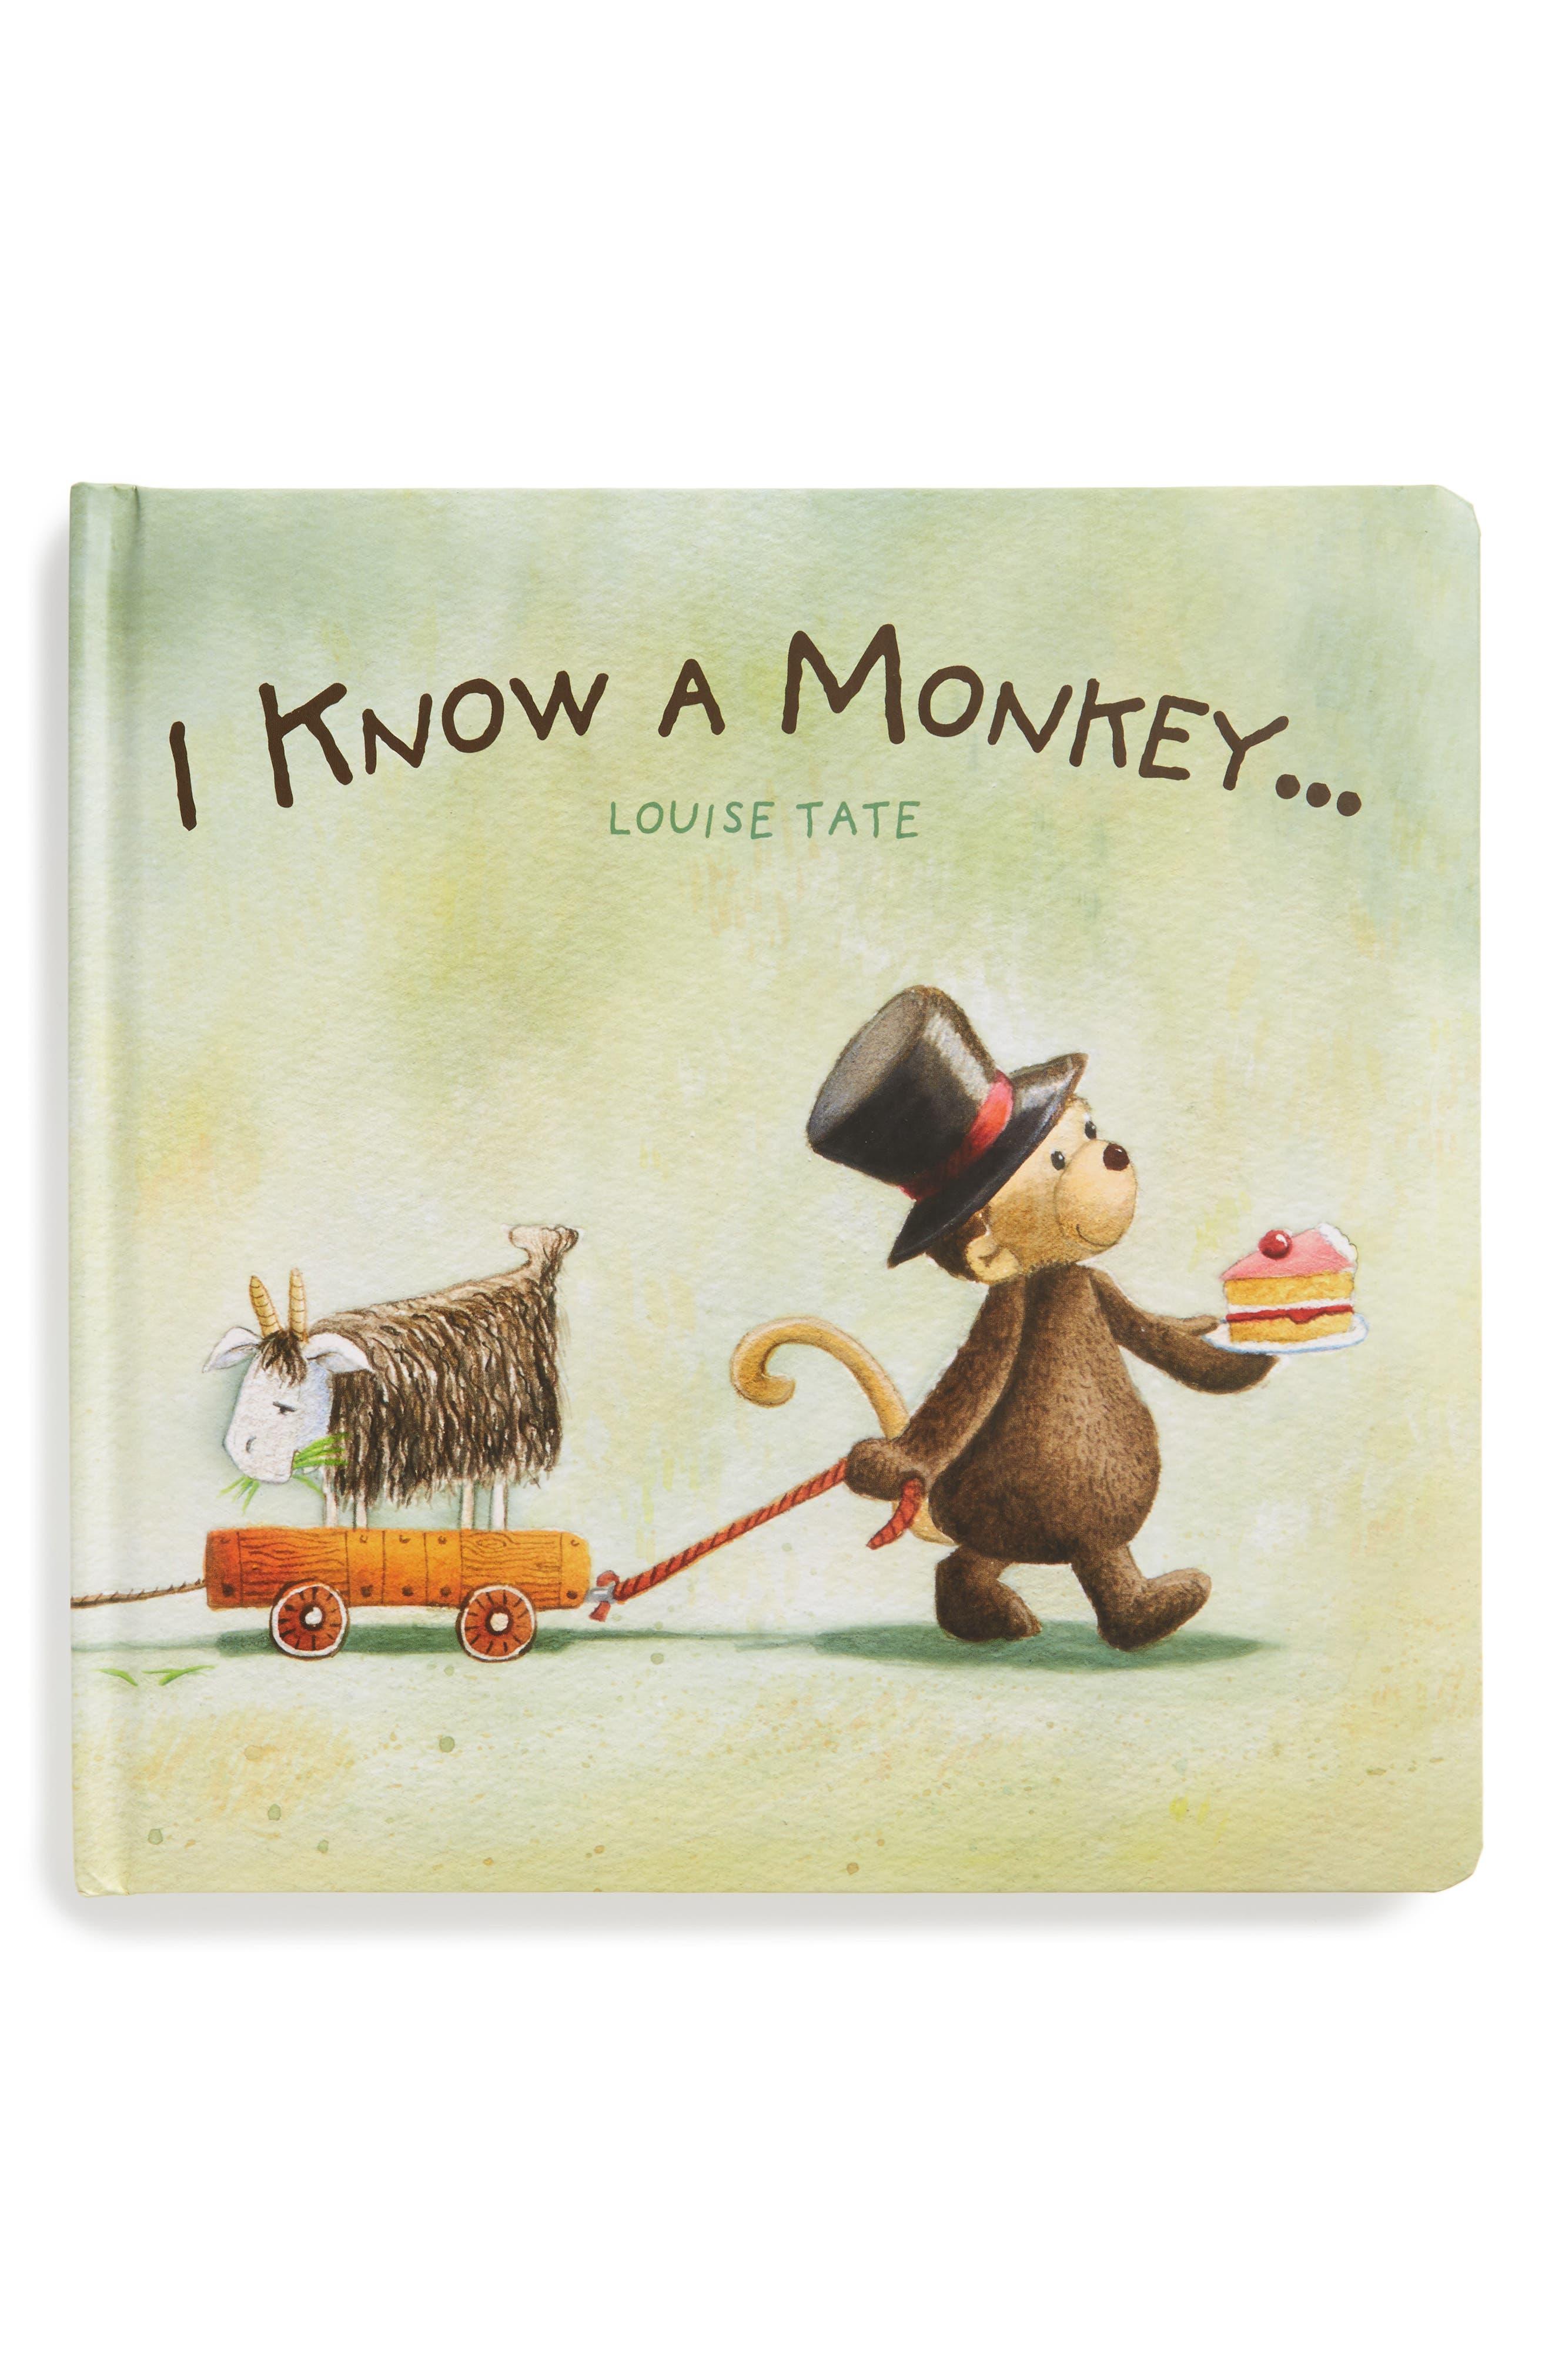 'I Know a Monkey' Board Book,                             Main thumbnail 1, color,                             NO COLOR